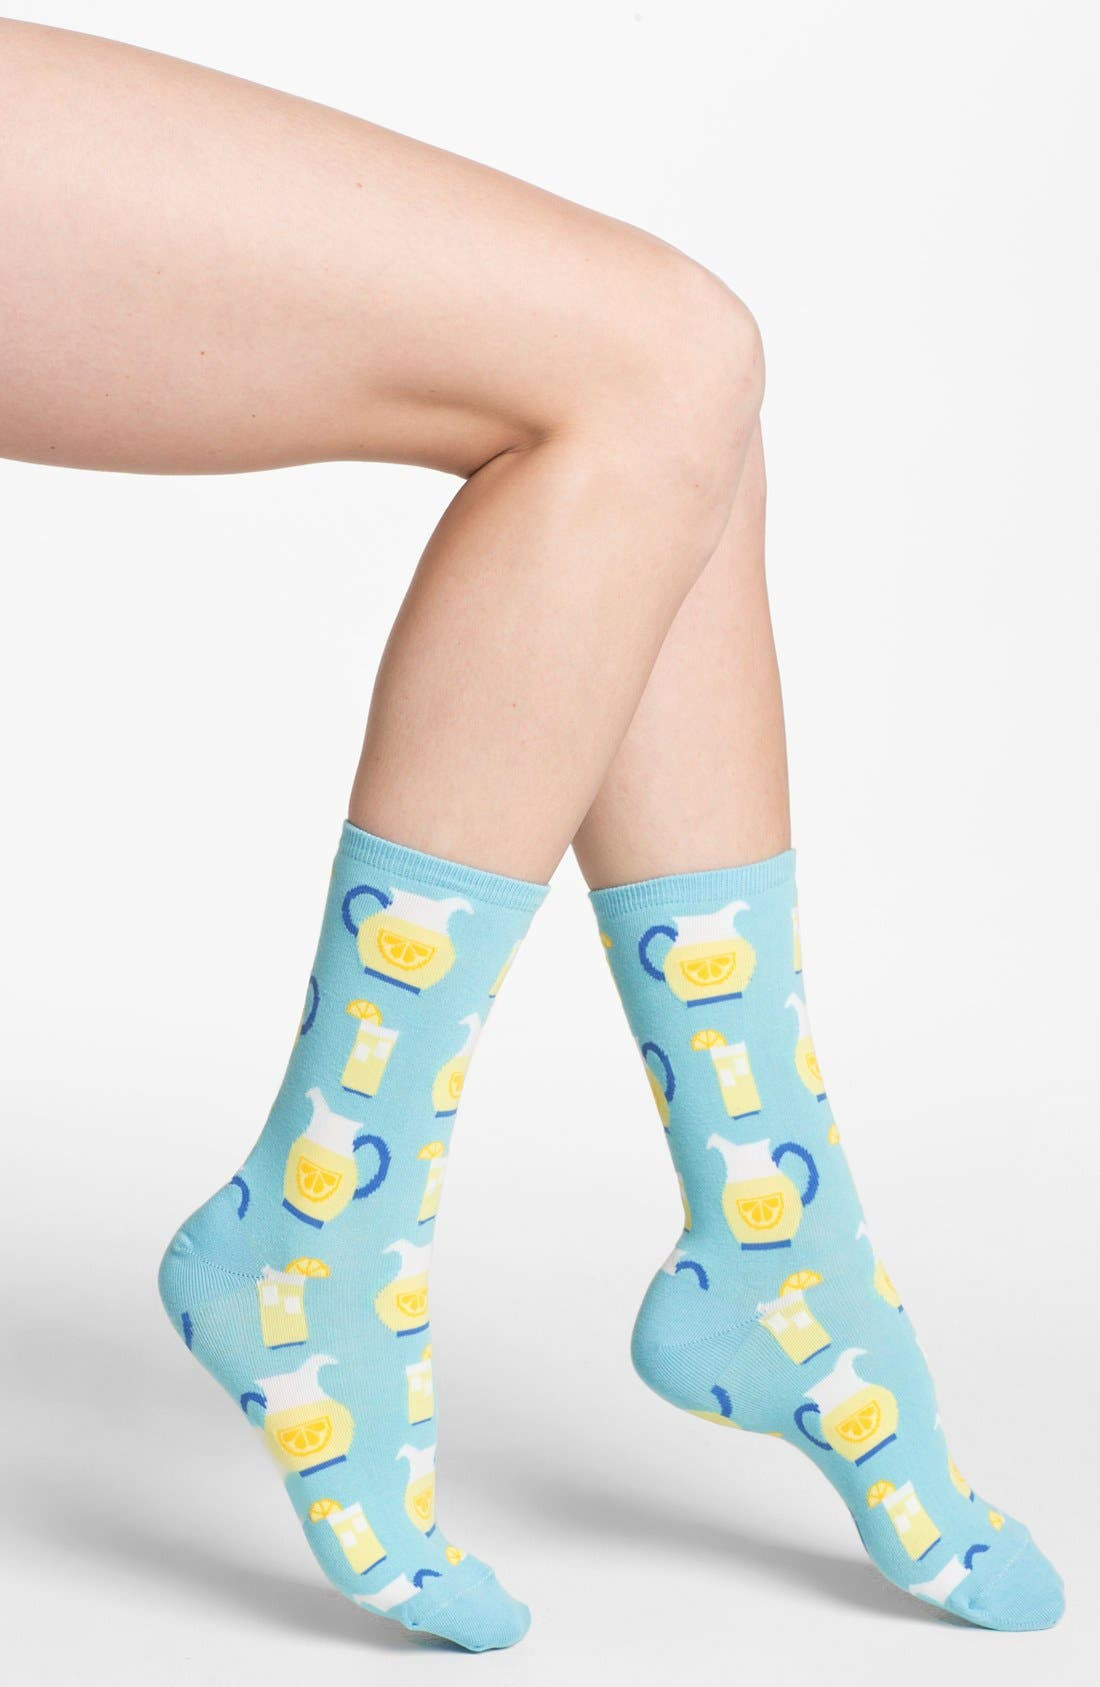 Alternate Image 1 Selected - Hot Sox 'Lemonade' Socks